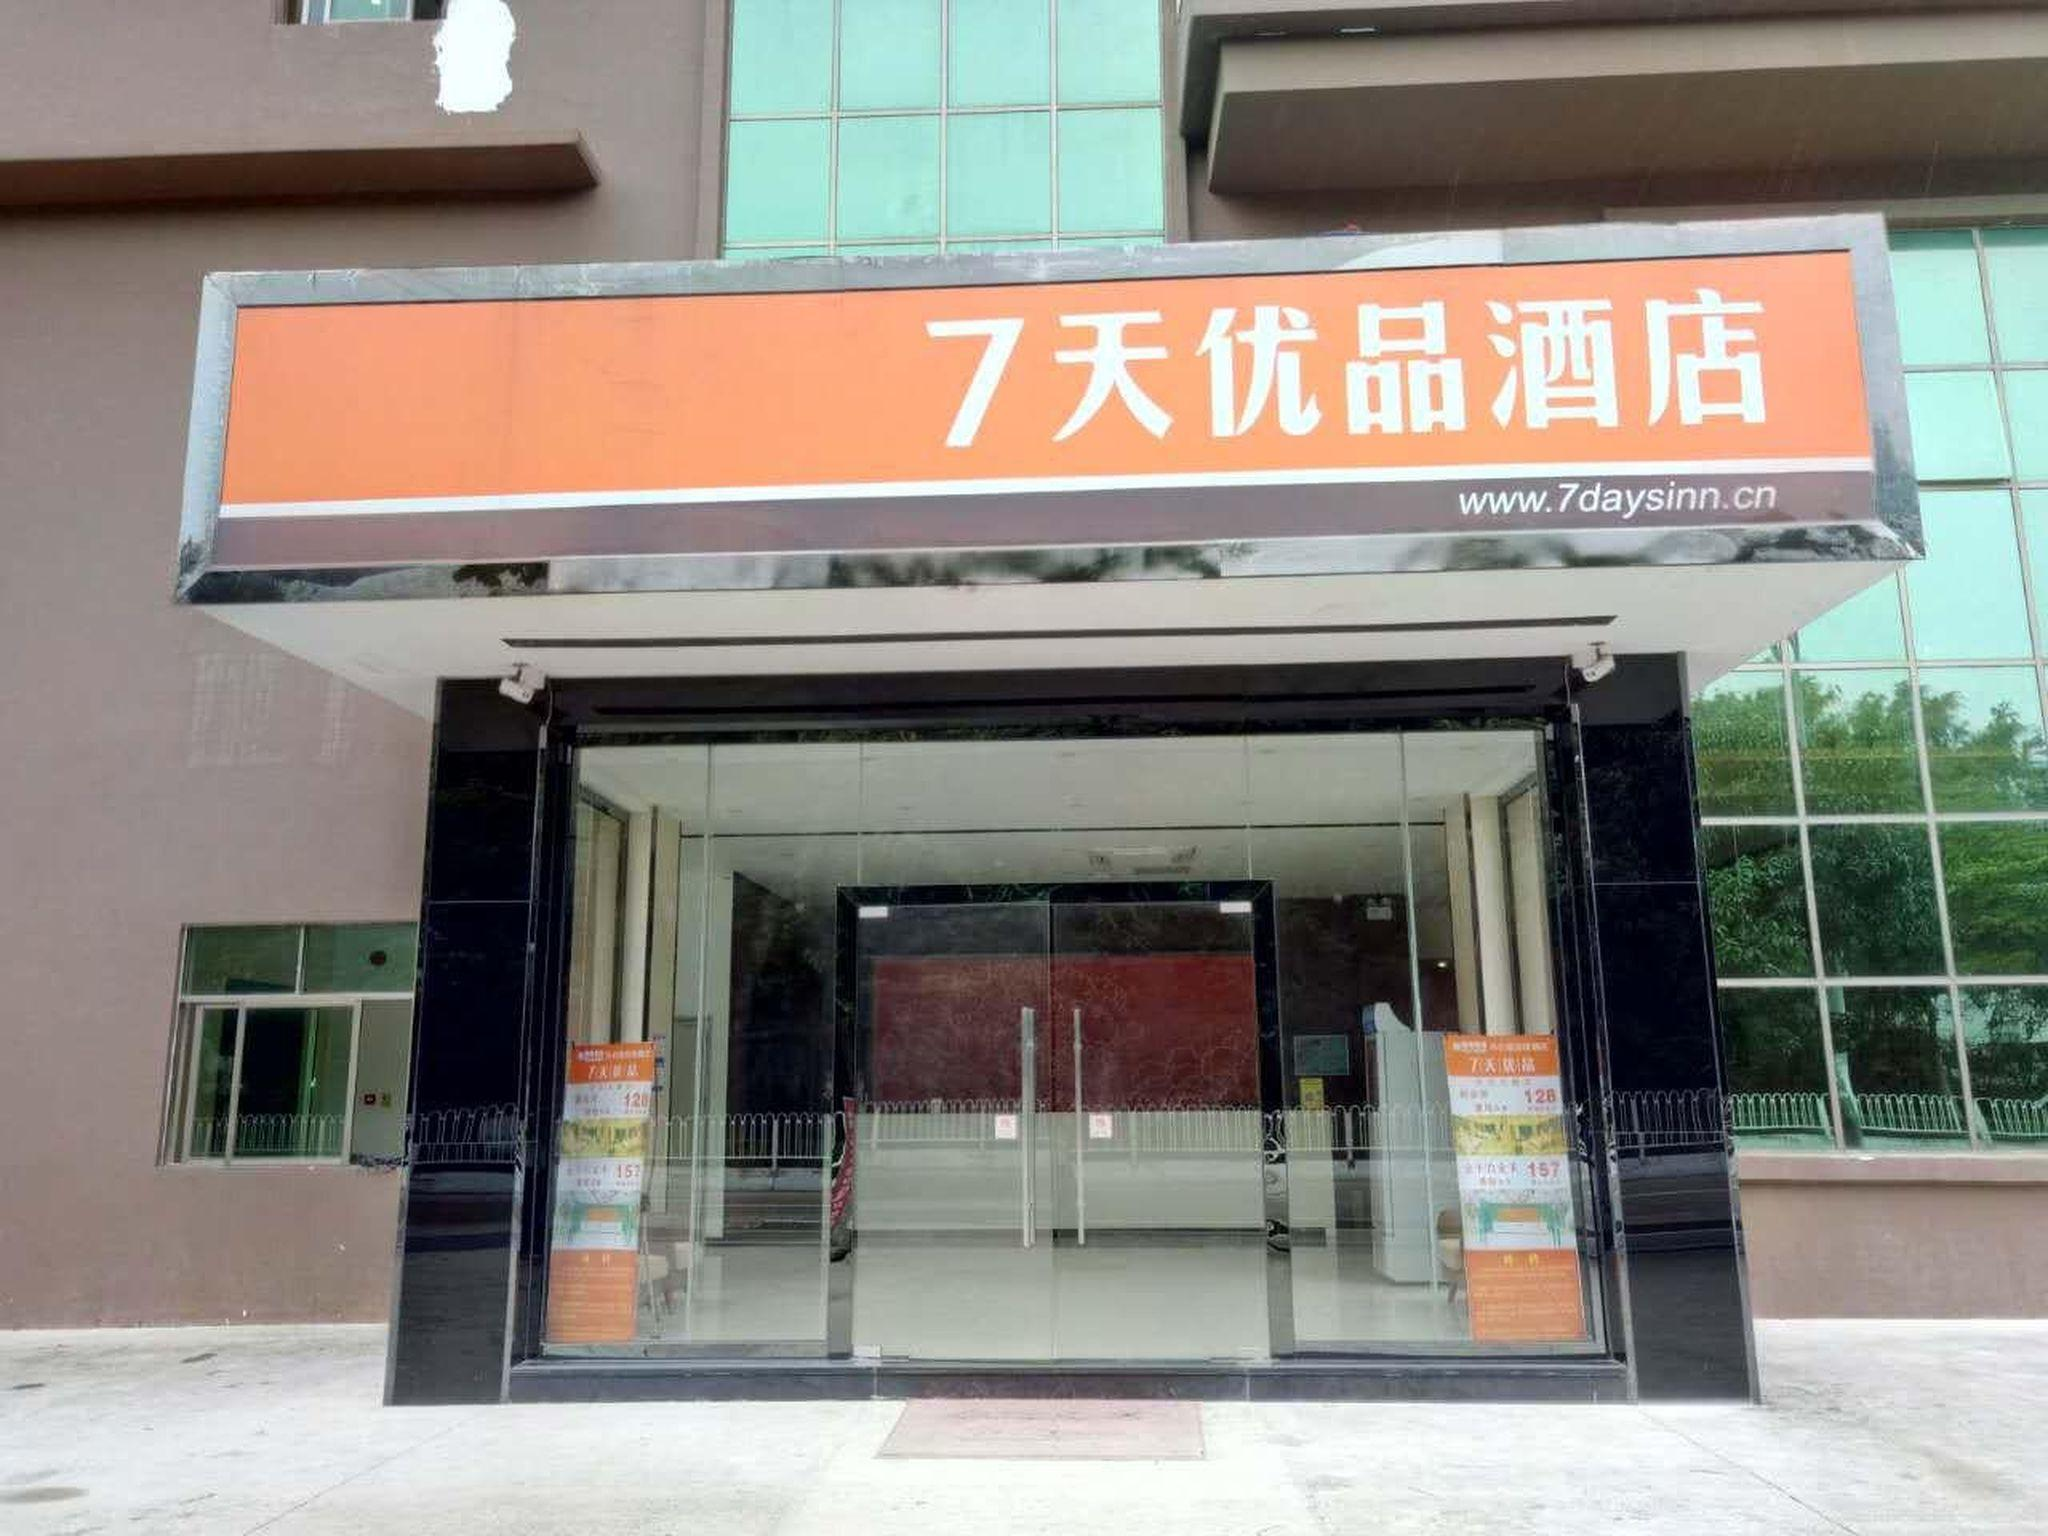 7 Days Premium Shenzhen Dapeng New District Jiaochangwei Branch